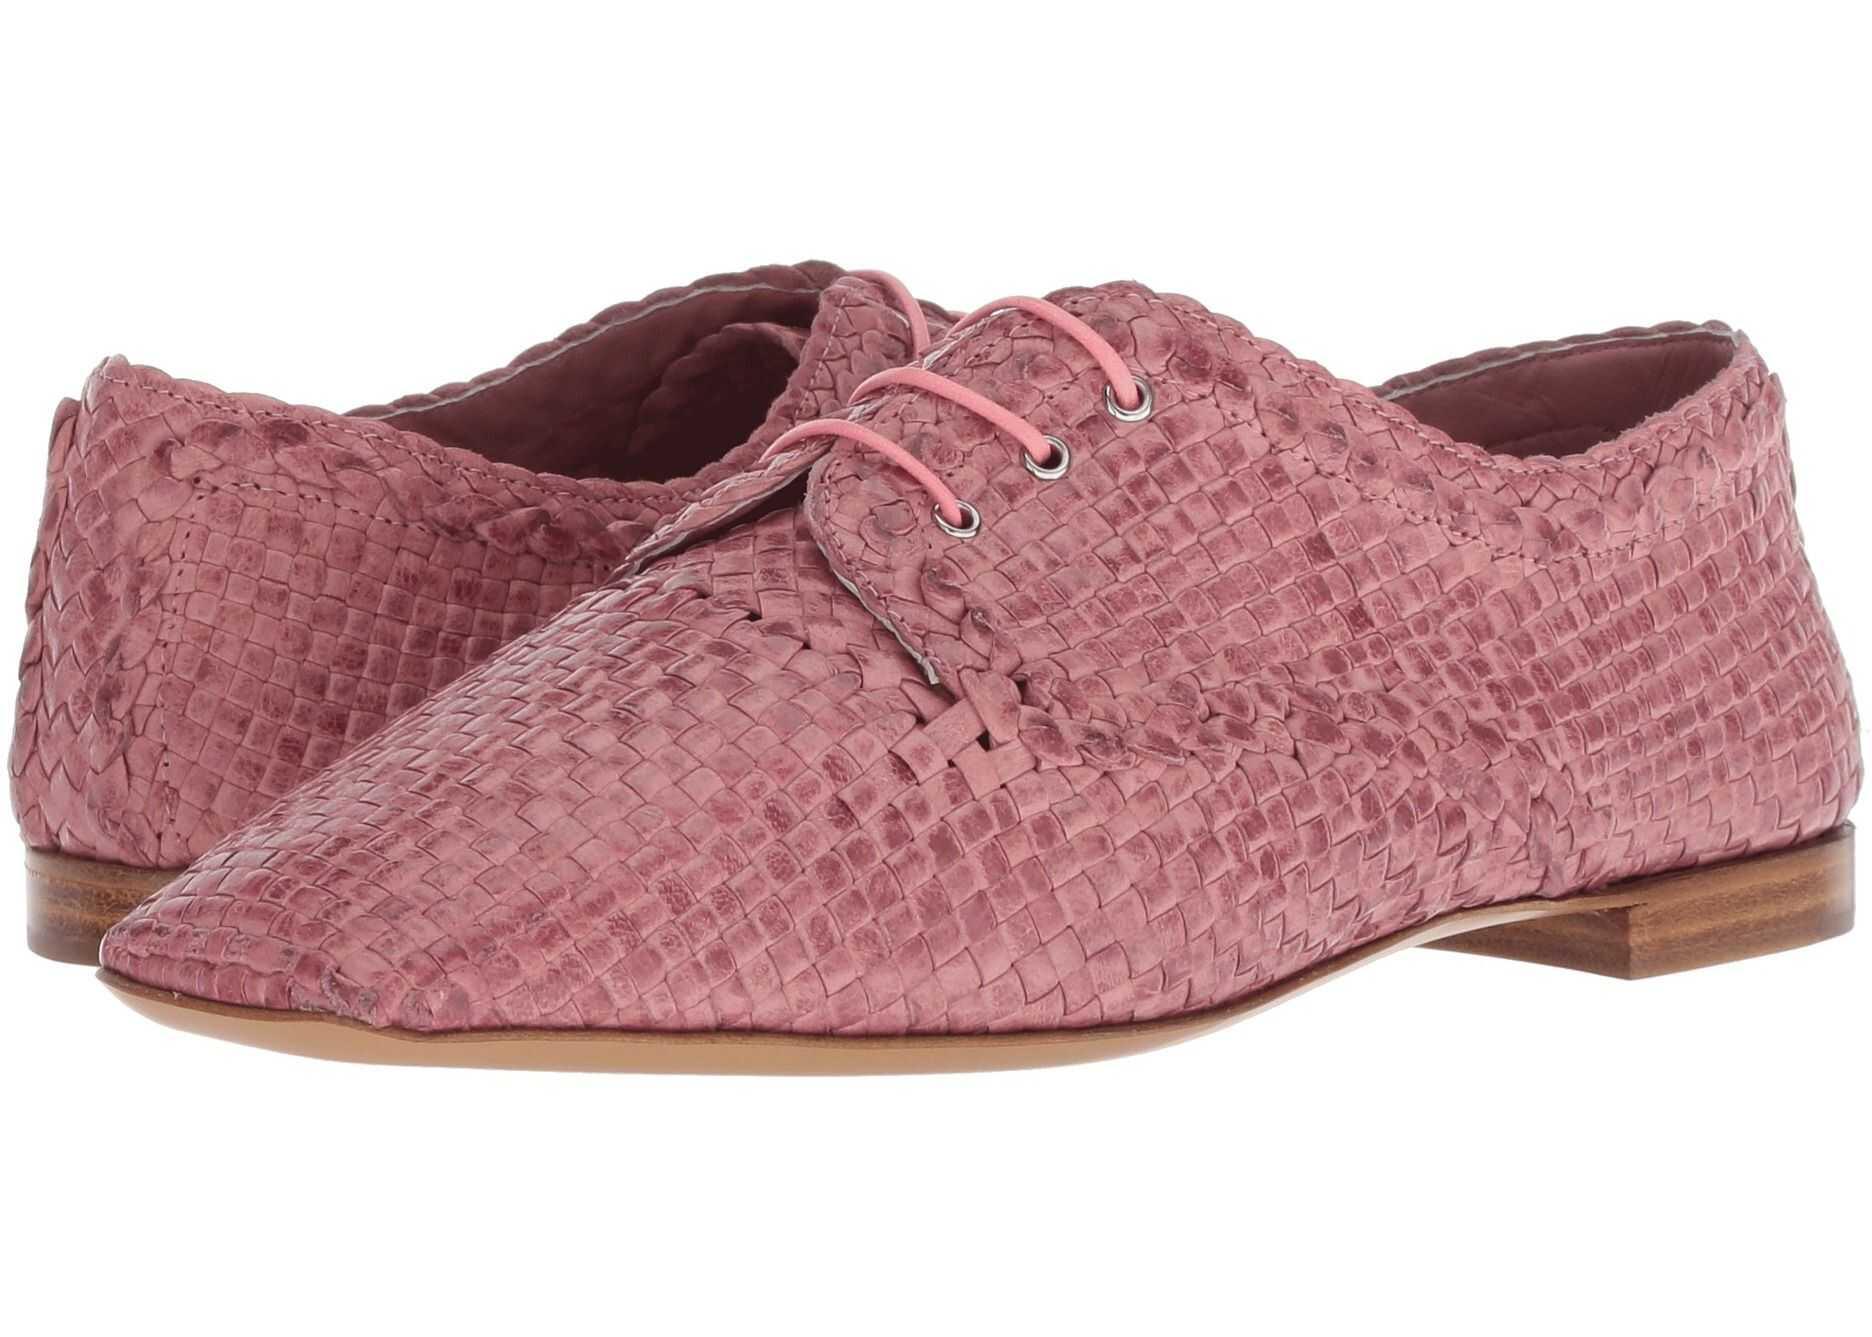 Emporio Armani Woven Oxford Pink